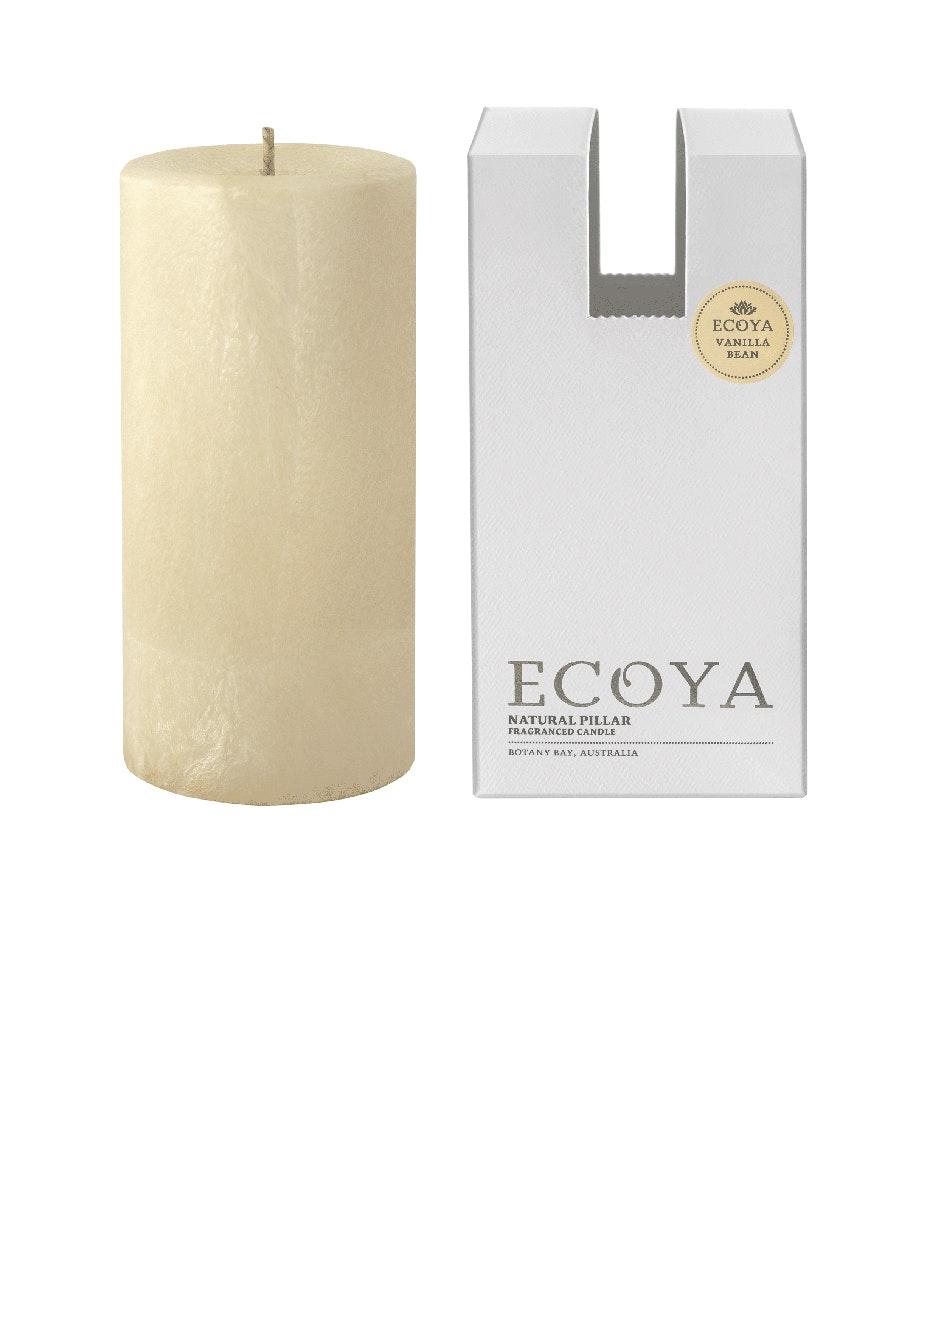 Ecoya - Pillar 75x155 Natural - Vanilla Bean